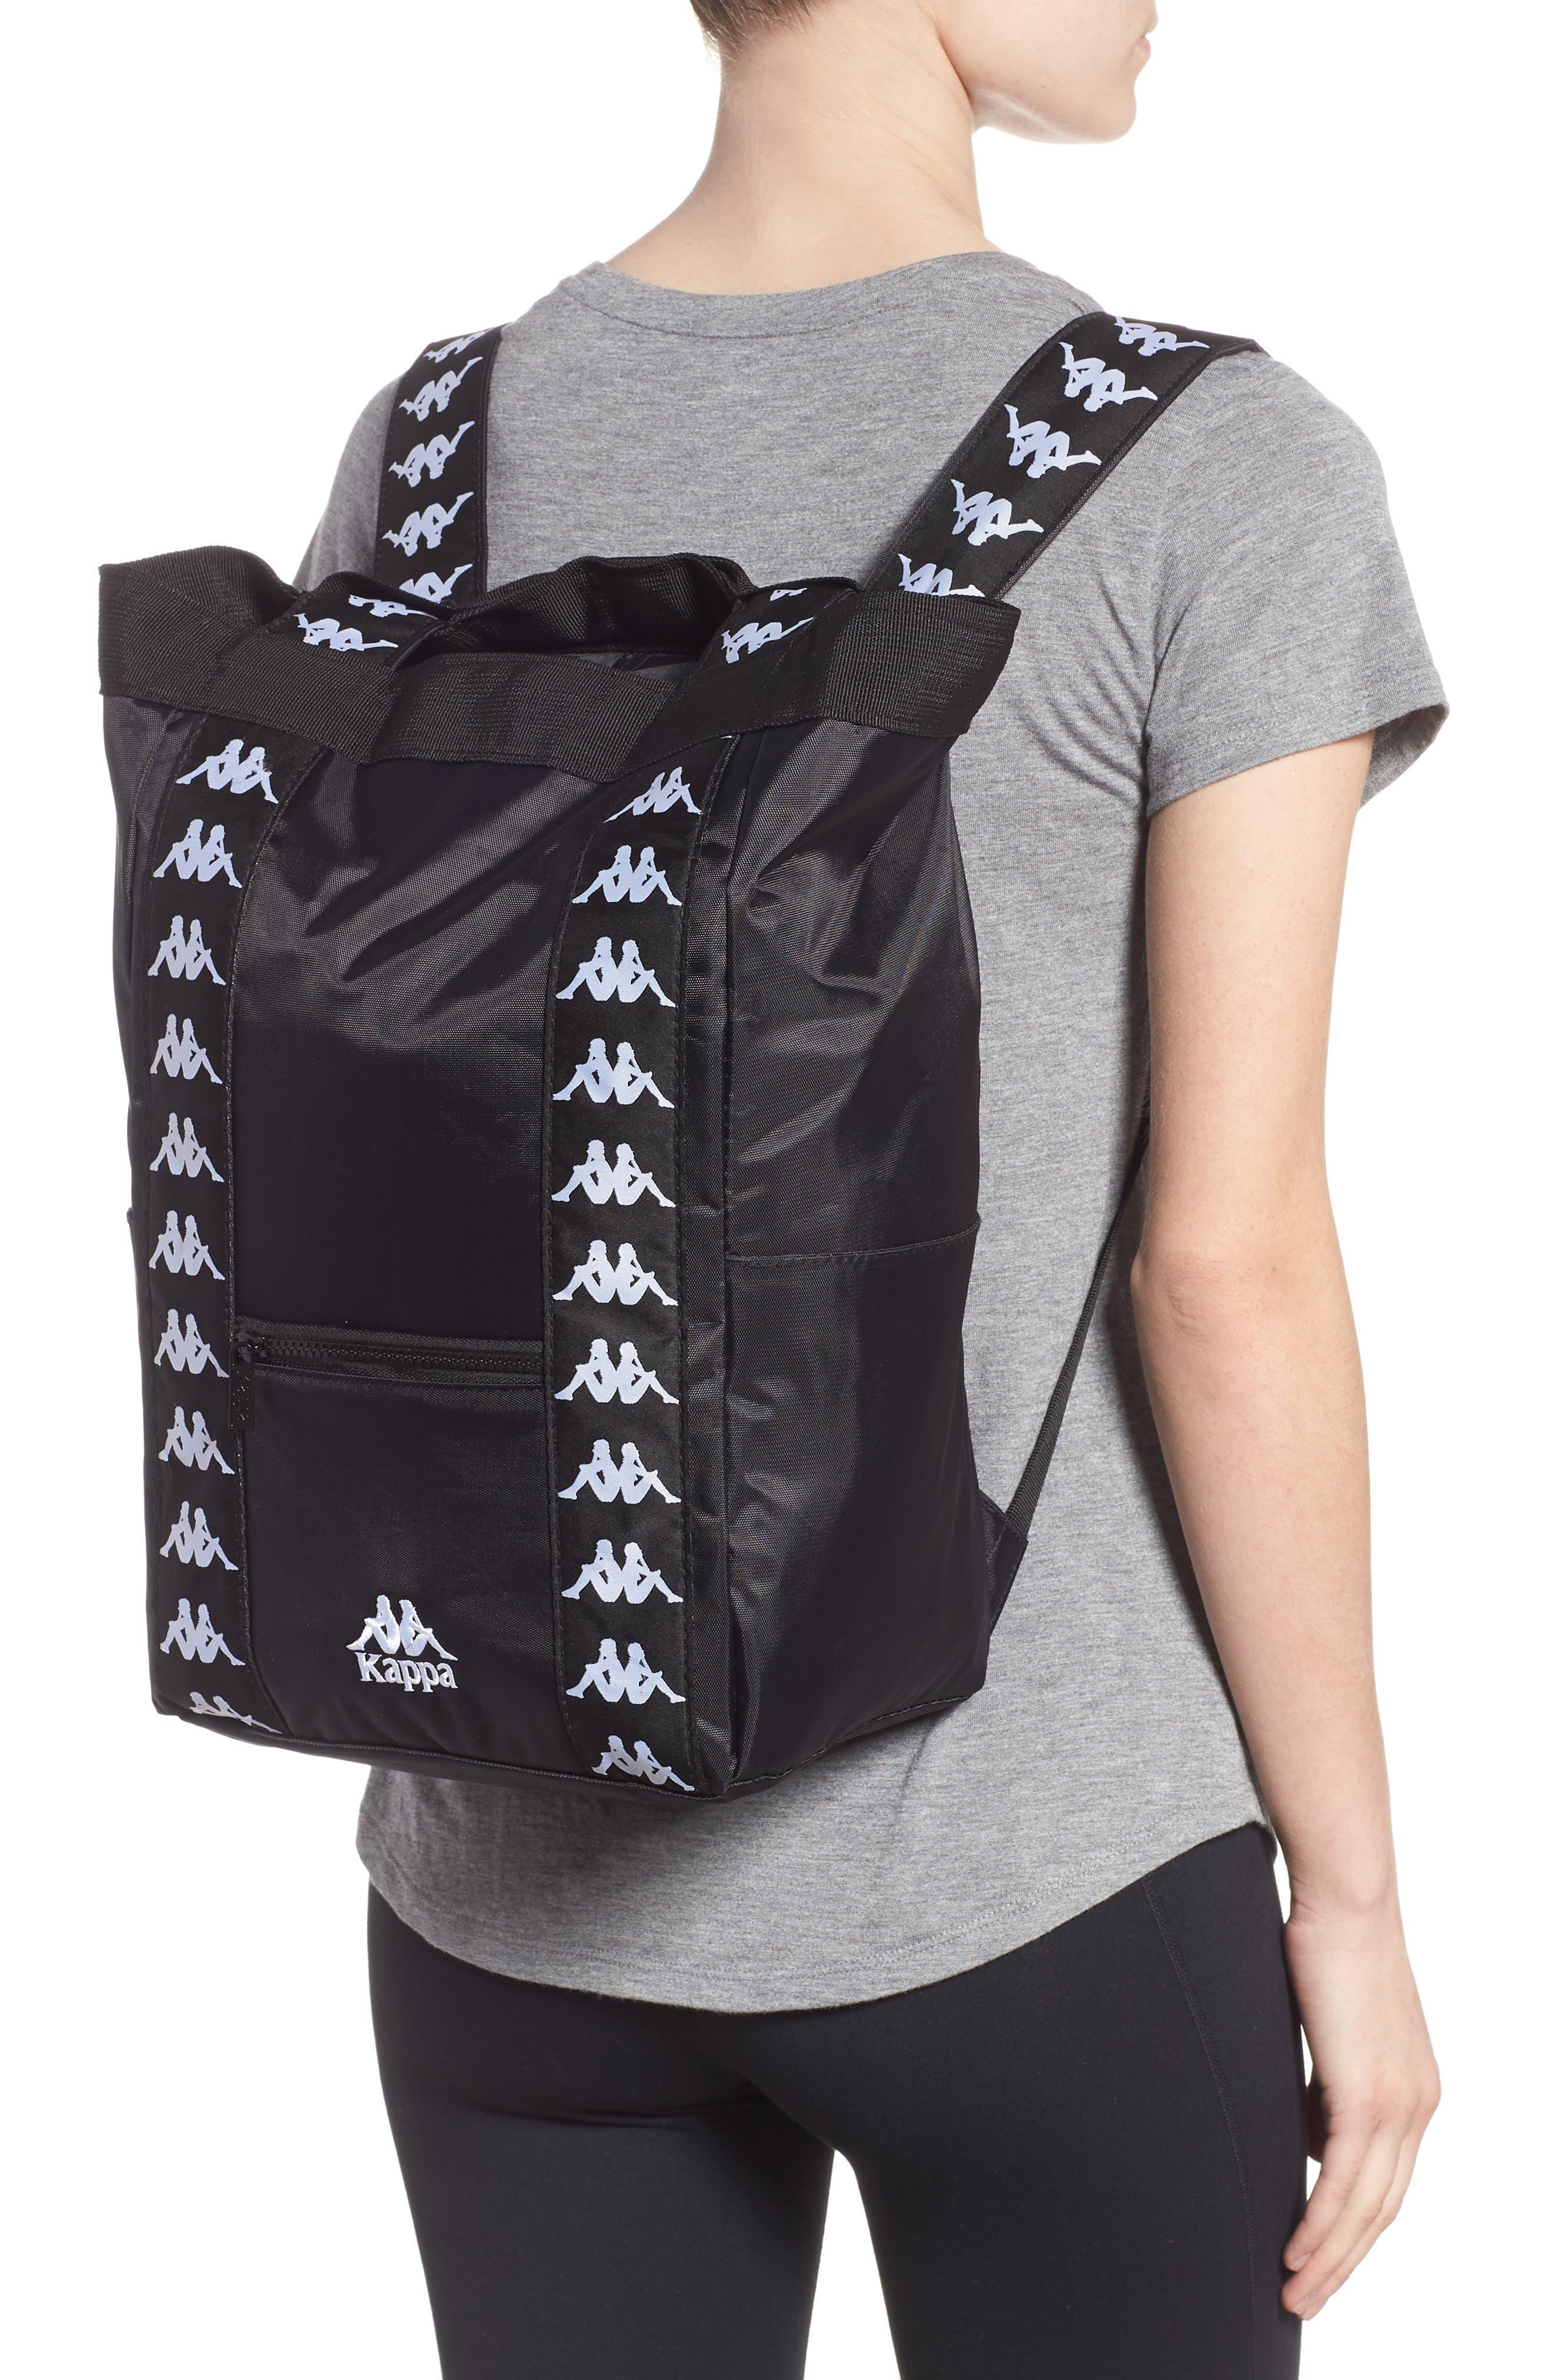 Medium Athletic Backpack,                             Alternate thumbnail 2, color,                             BLACK-WHITE